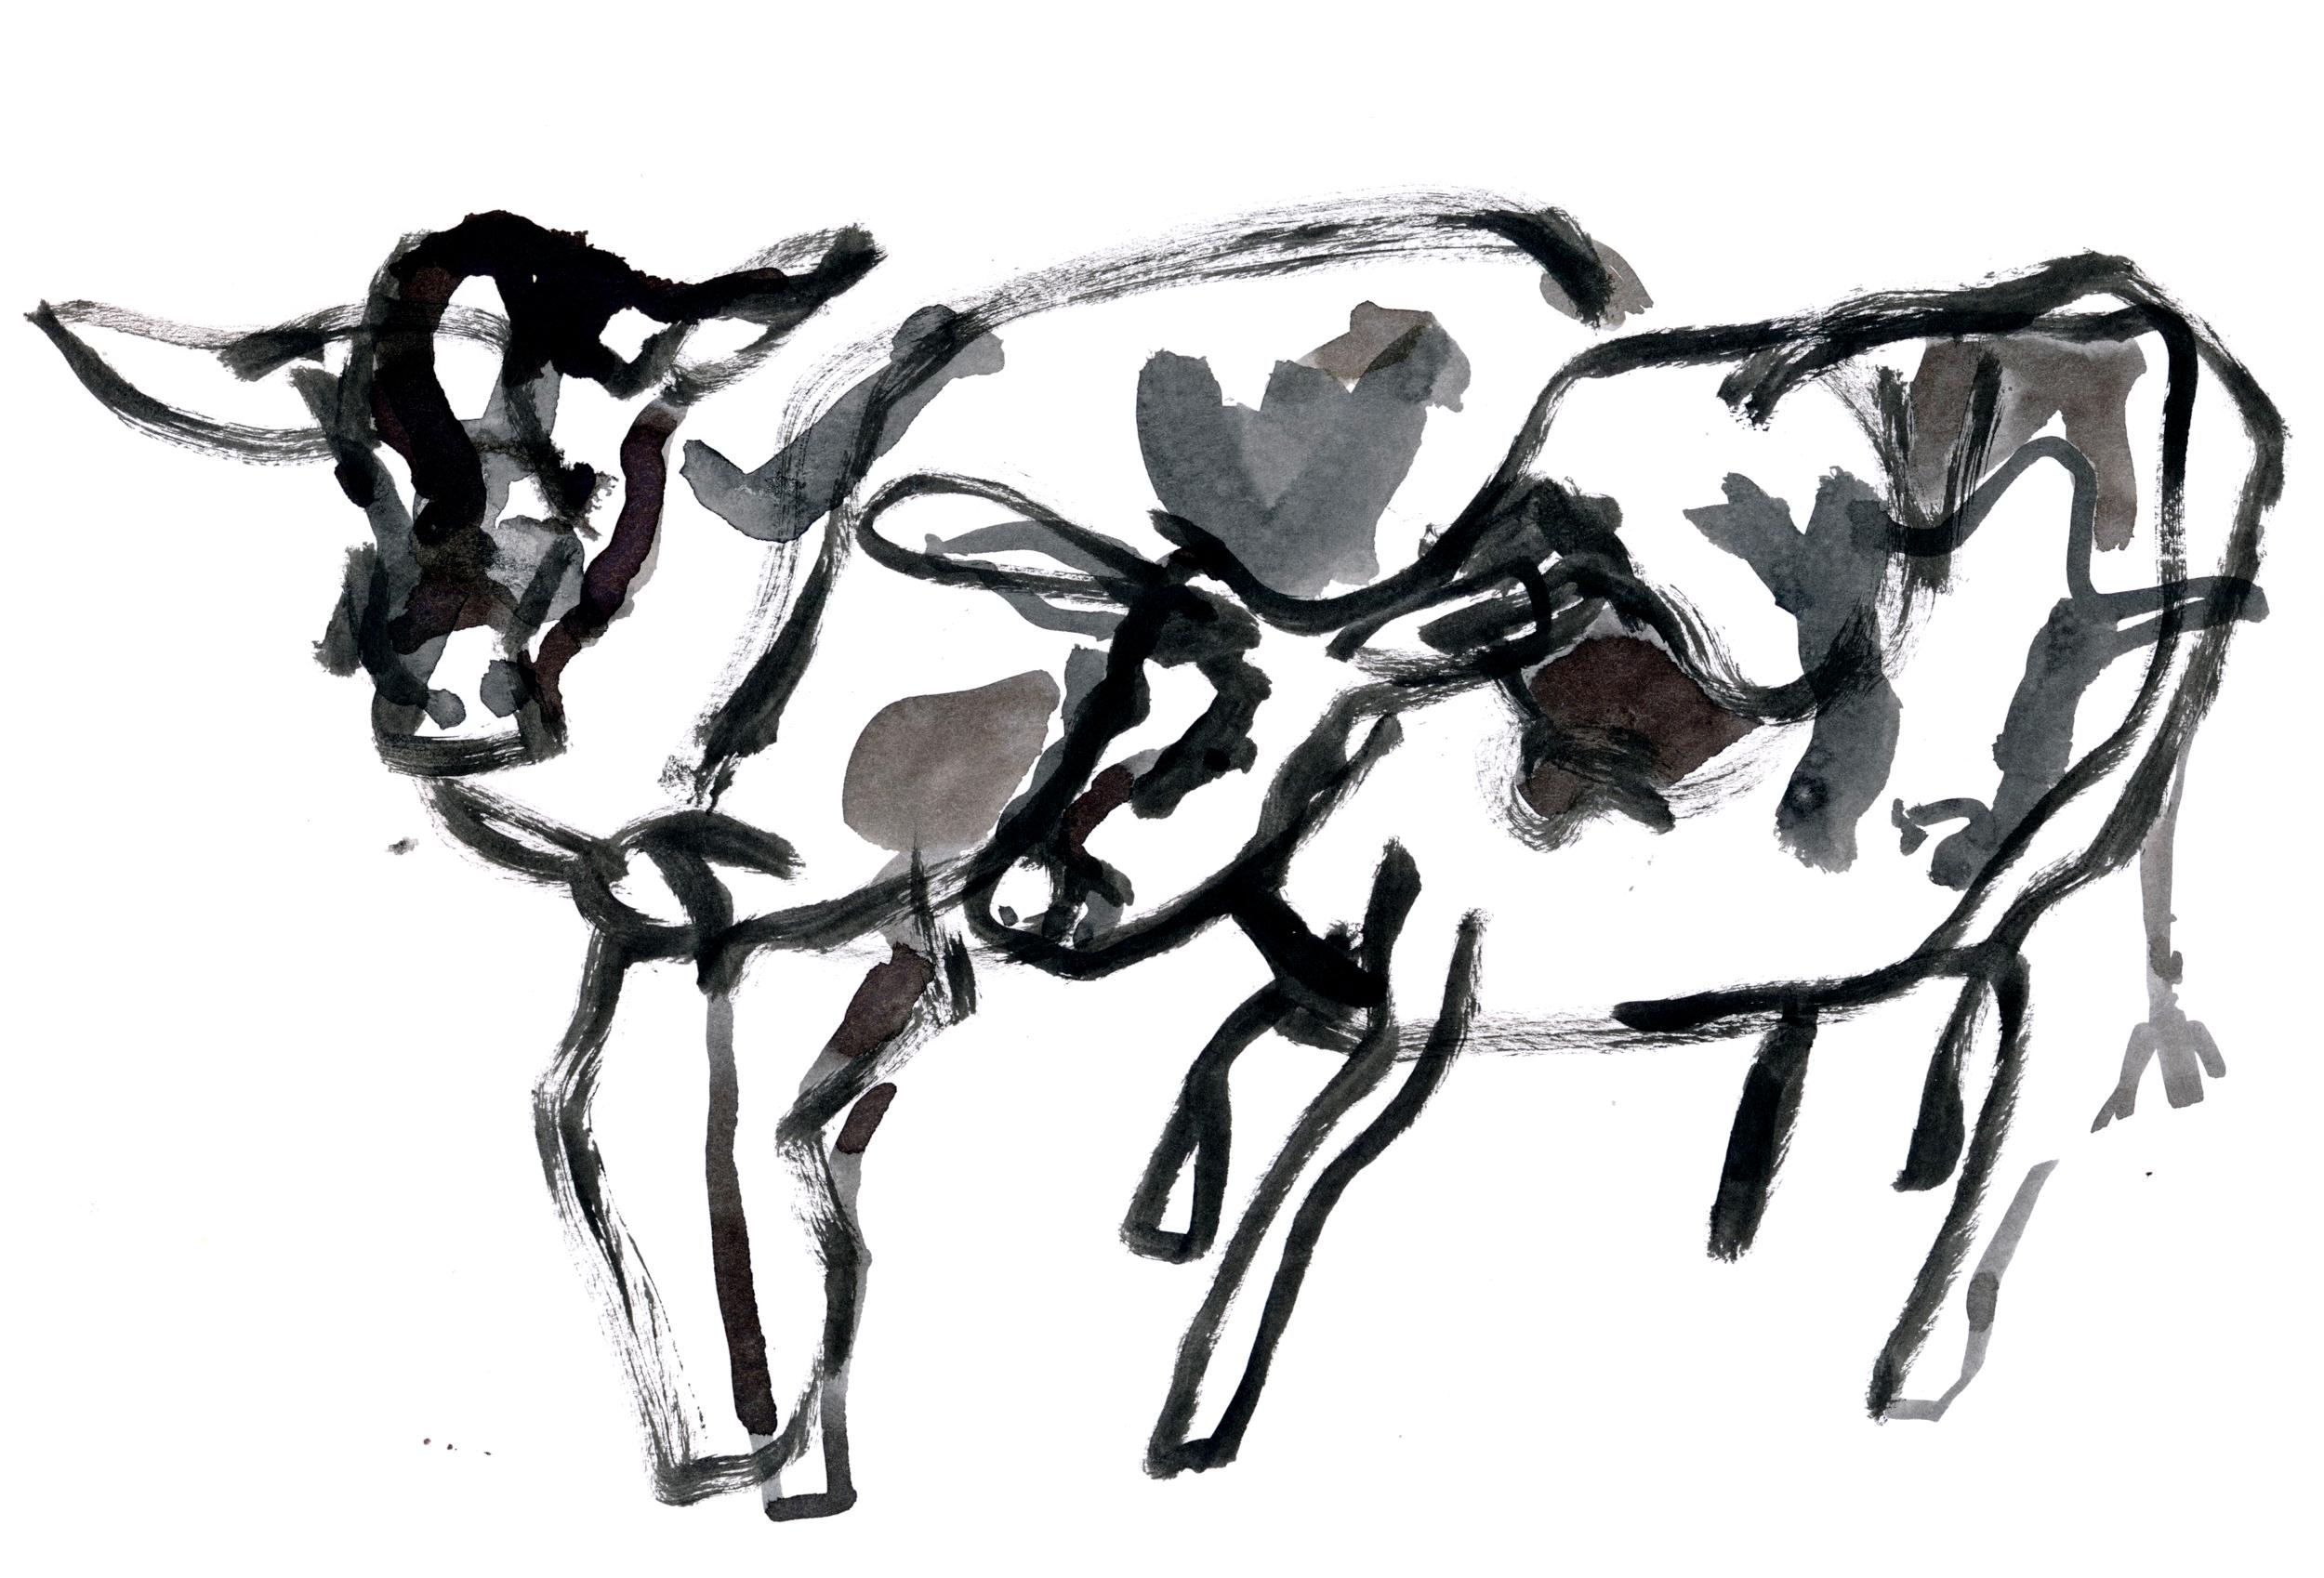 2015.11.29 Cows 1.jpg